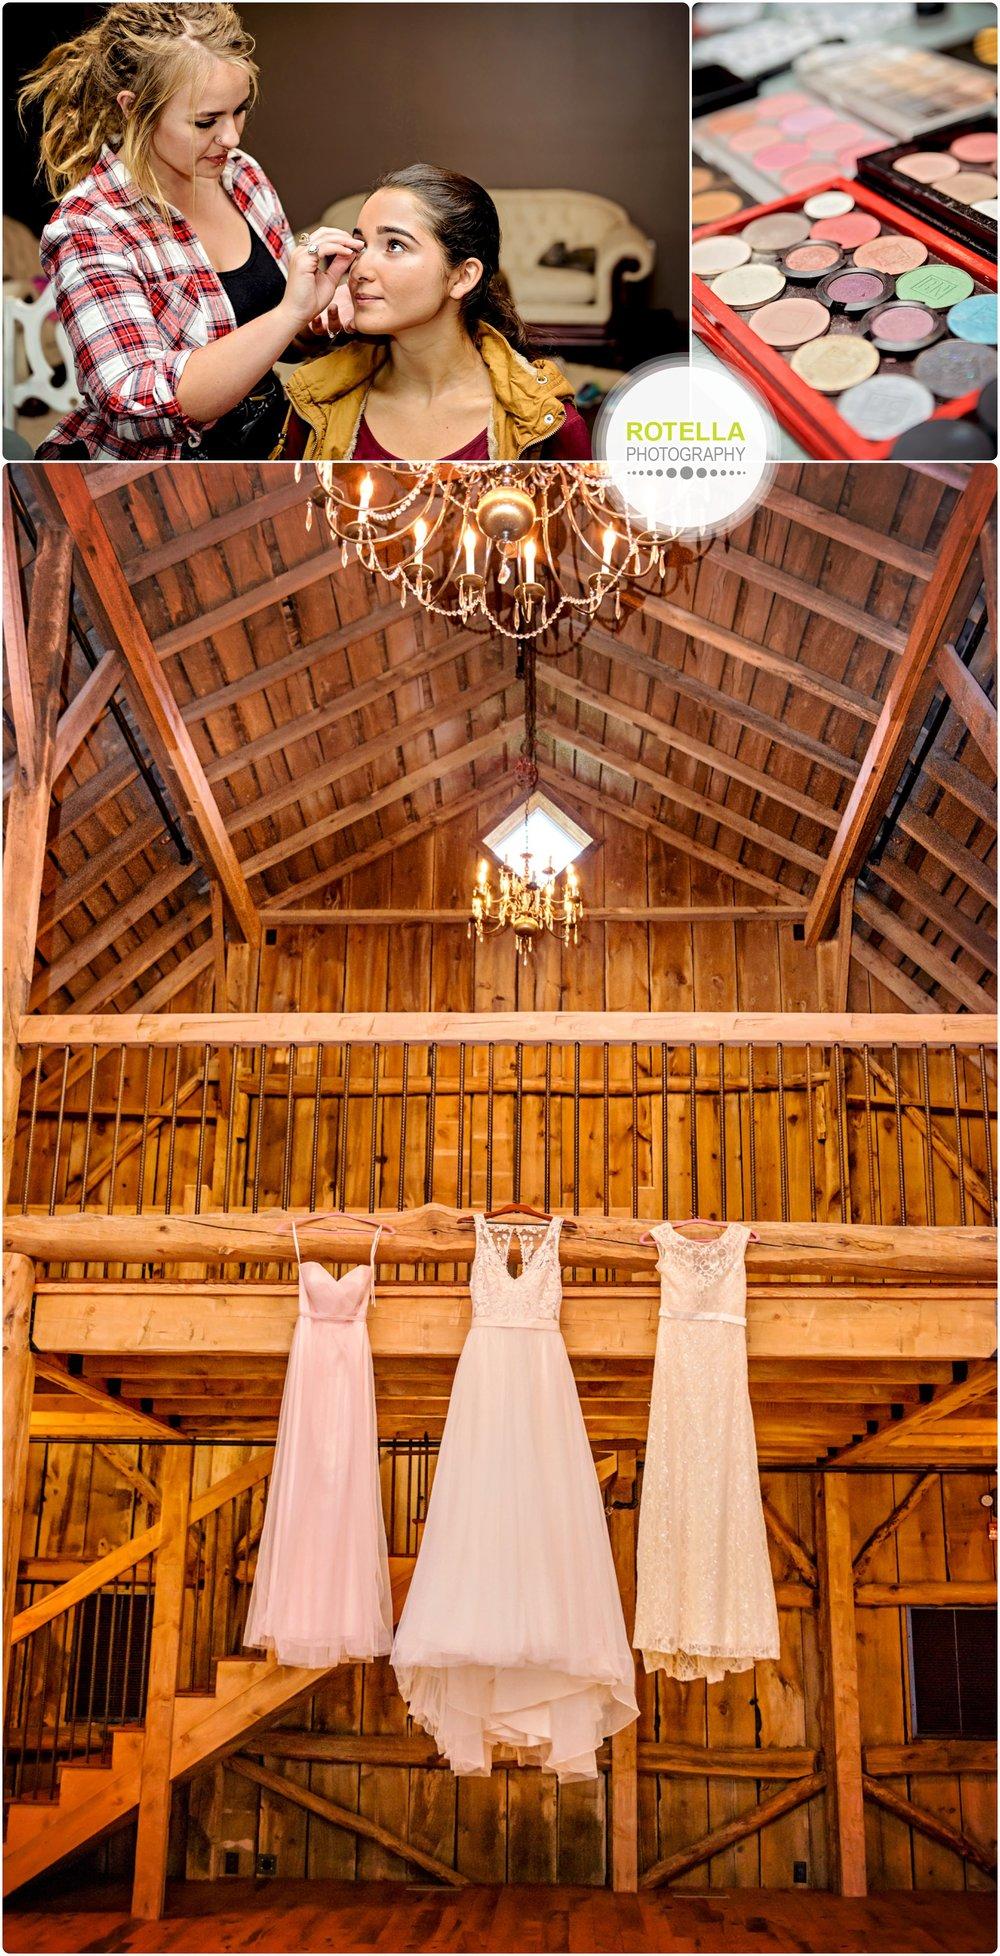 Rolling Ridge Barn and Dresses